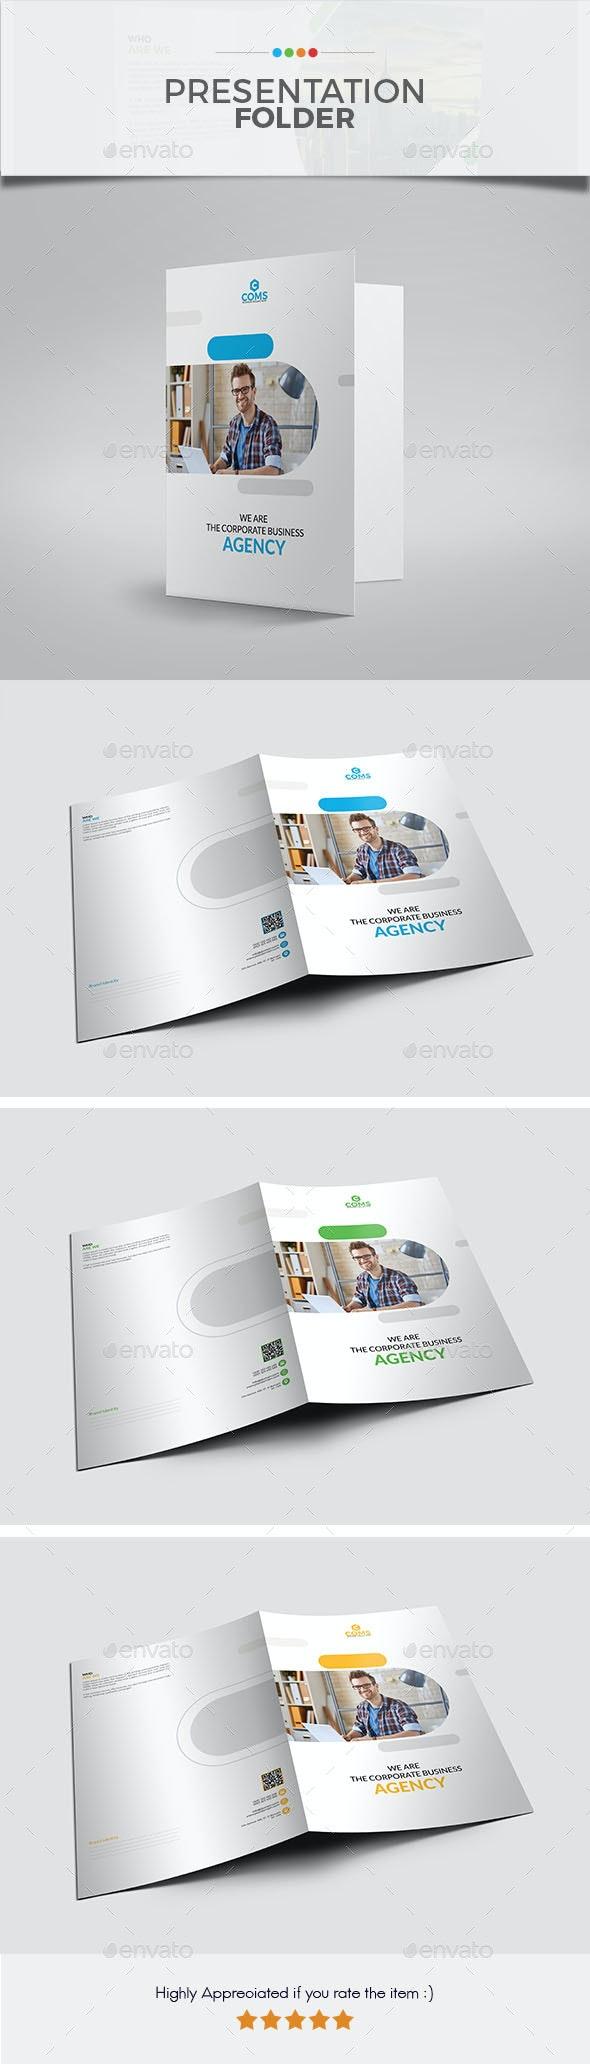 Presentation Folder 05 - Stationery Print Templates